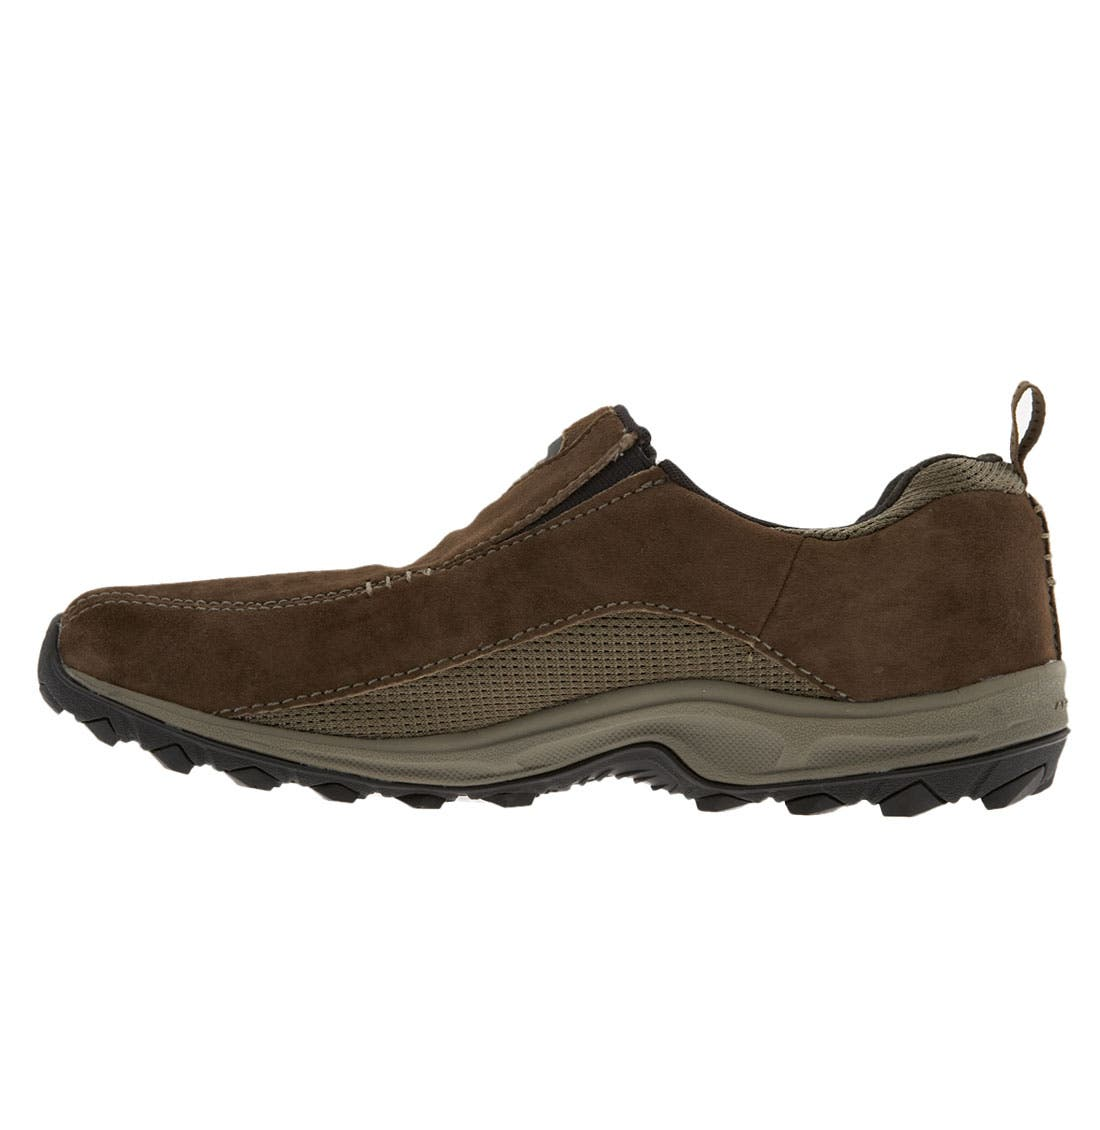 NEW BALANCE,                             '755' Walking Shoe,                             Alternate thumbnail 2, color,                             225